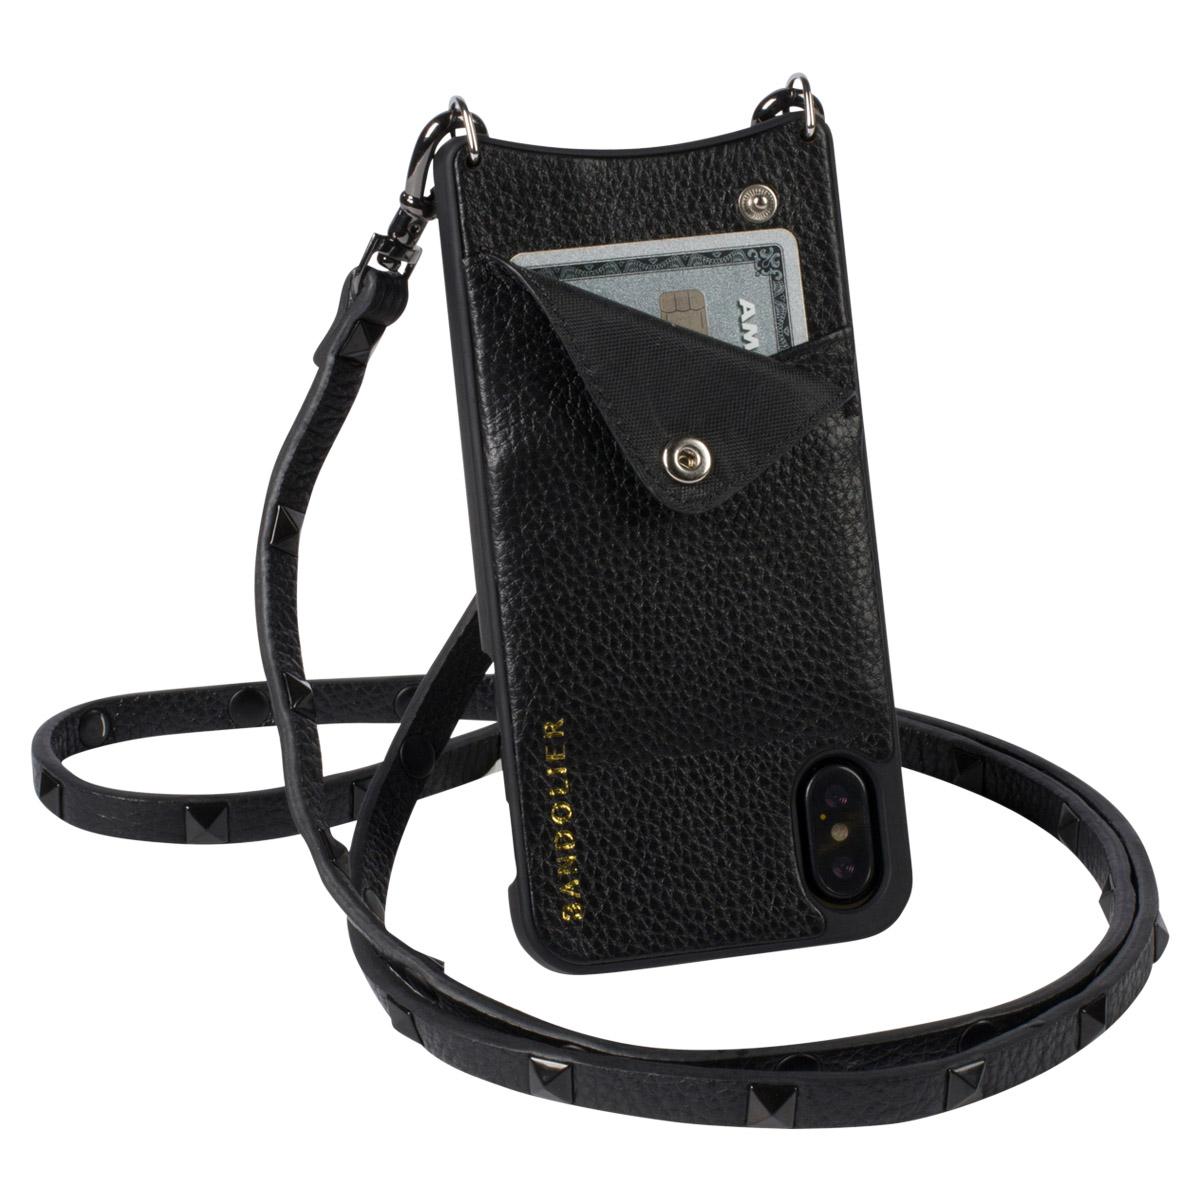 BANDOLIER iPhone XR SARAH BLACK バンドリヤー ケース ショルダー スマホ アイフォン レザー メンズ レディース ブラック 10SAR1001[194]